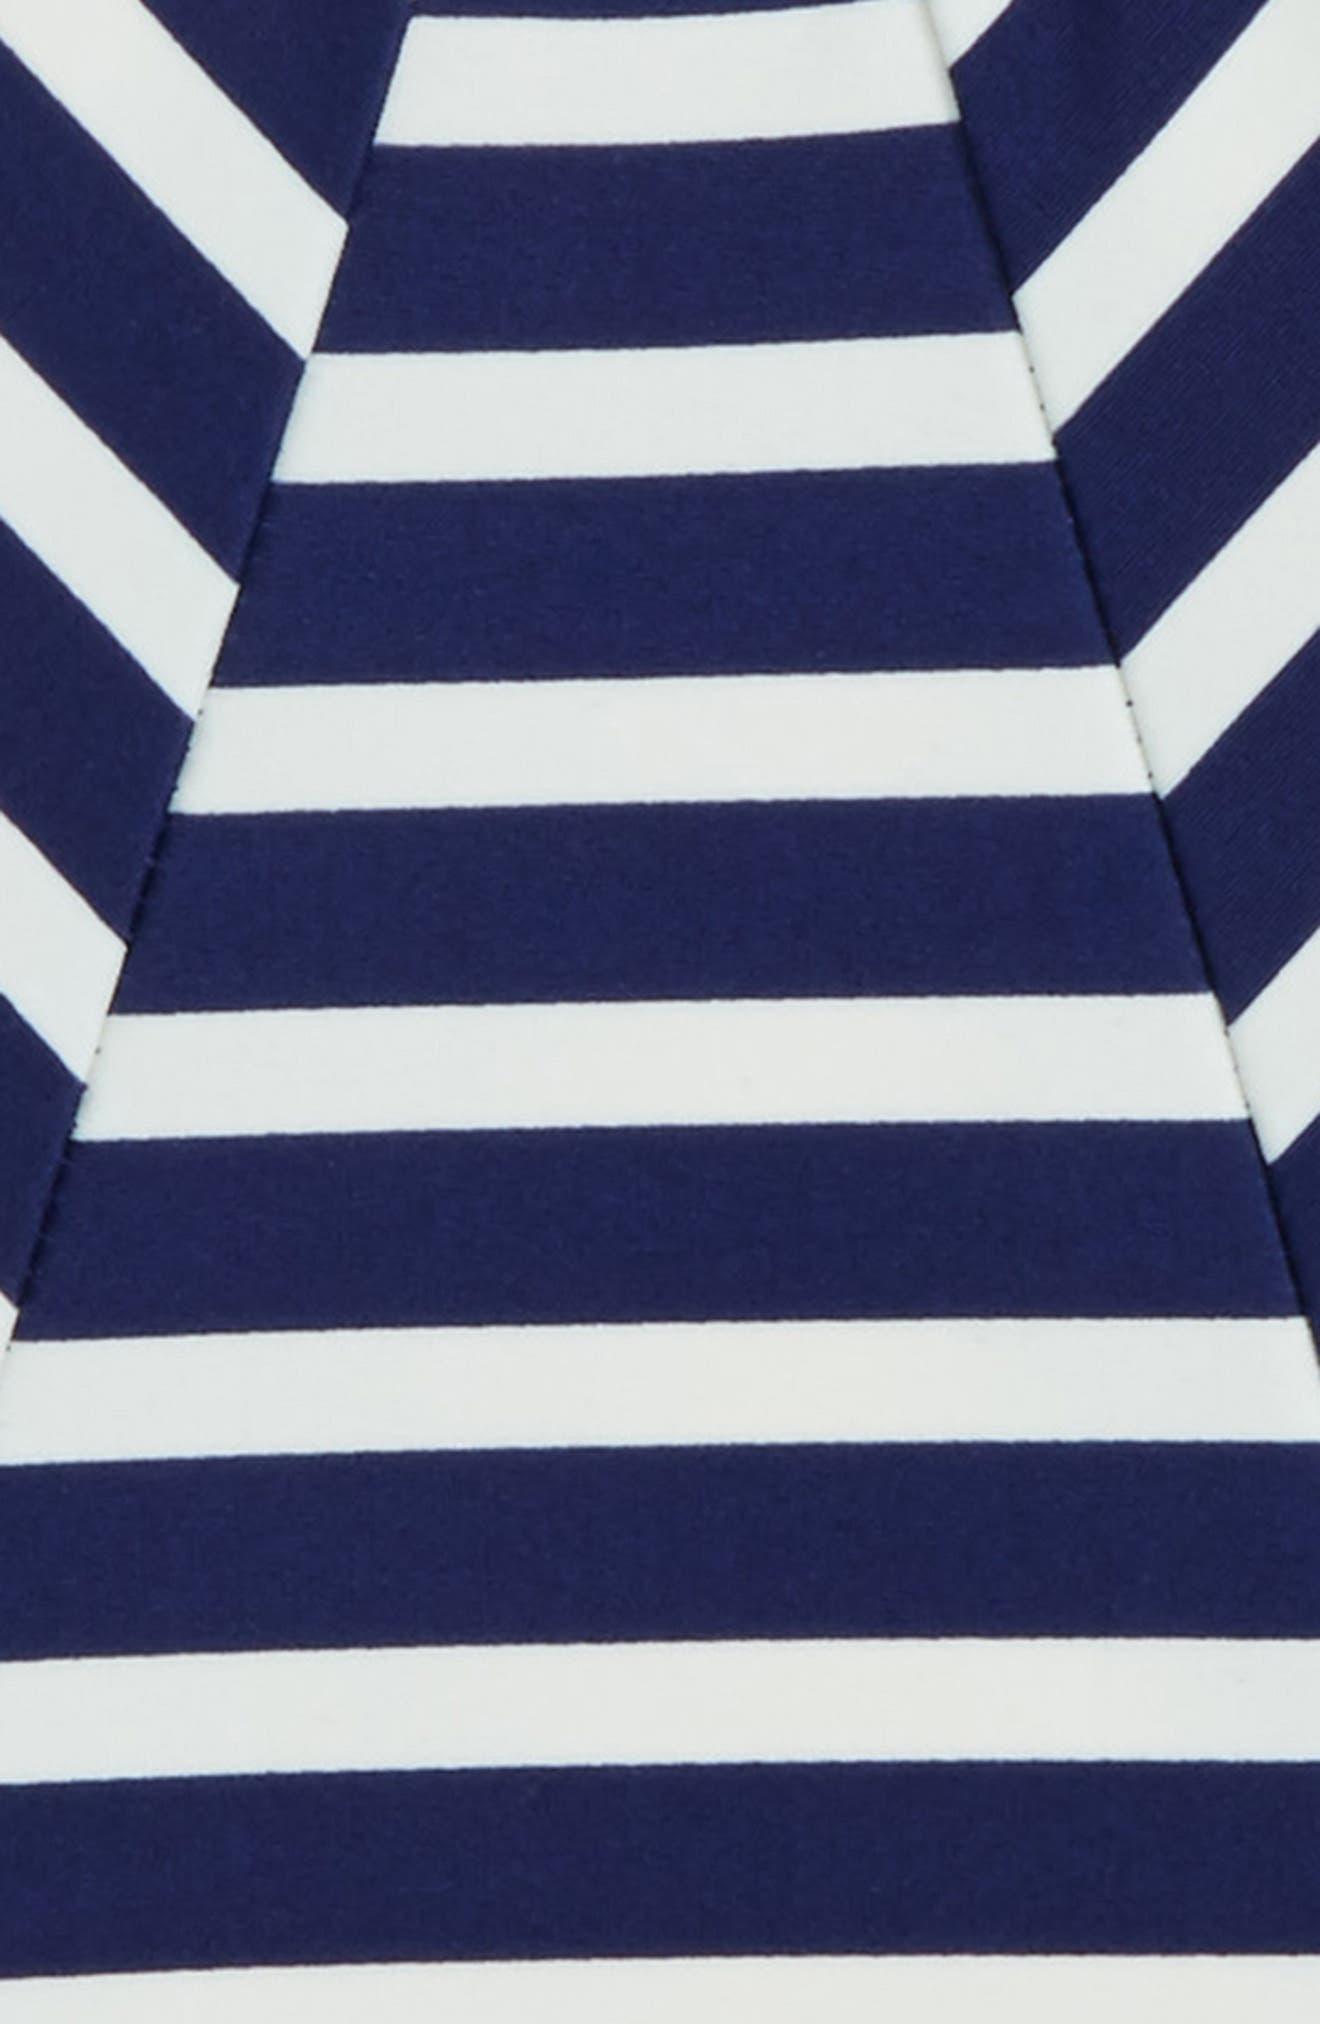 Stripe One-Piece Swimsuit,                             Alternate thumbnail 2, color,